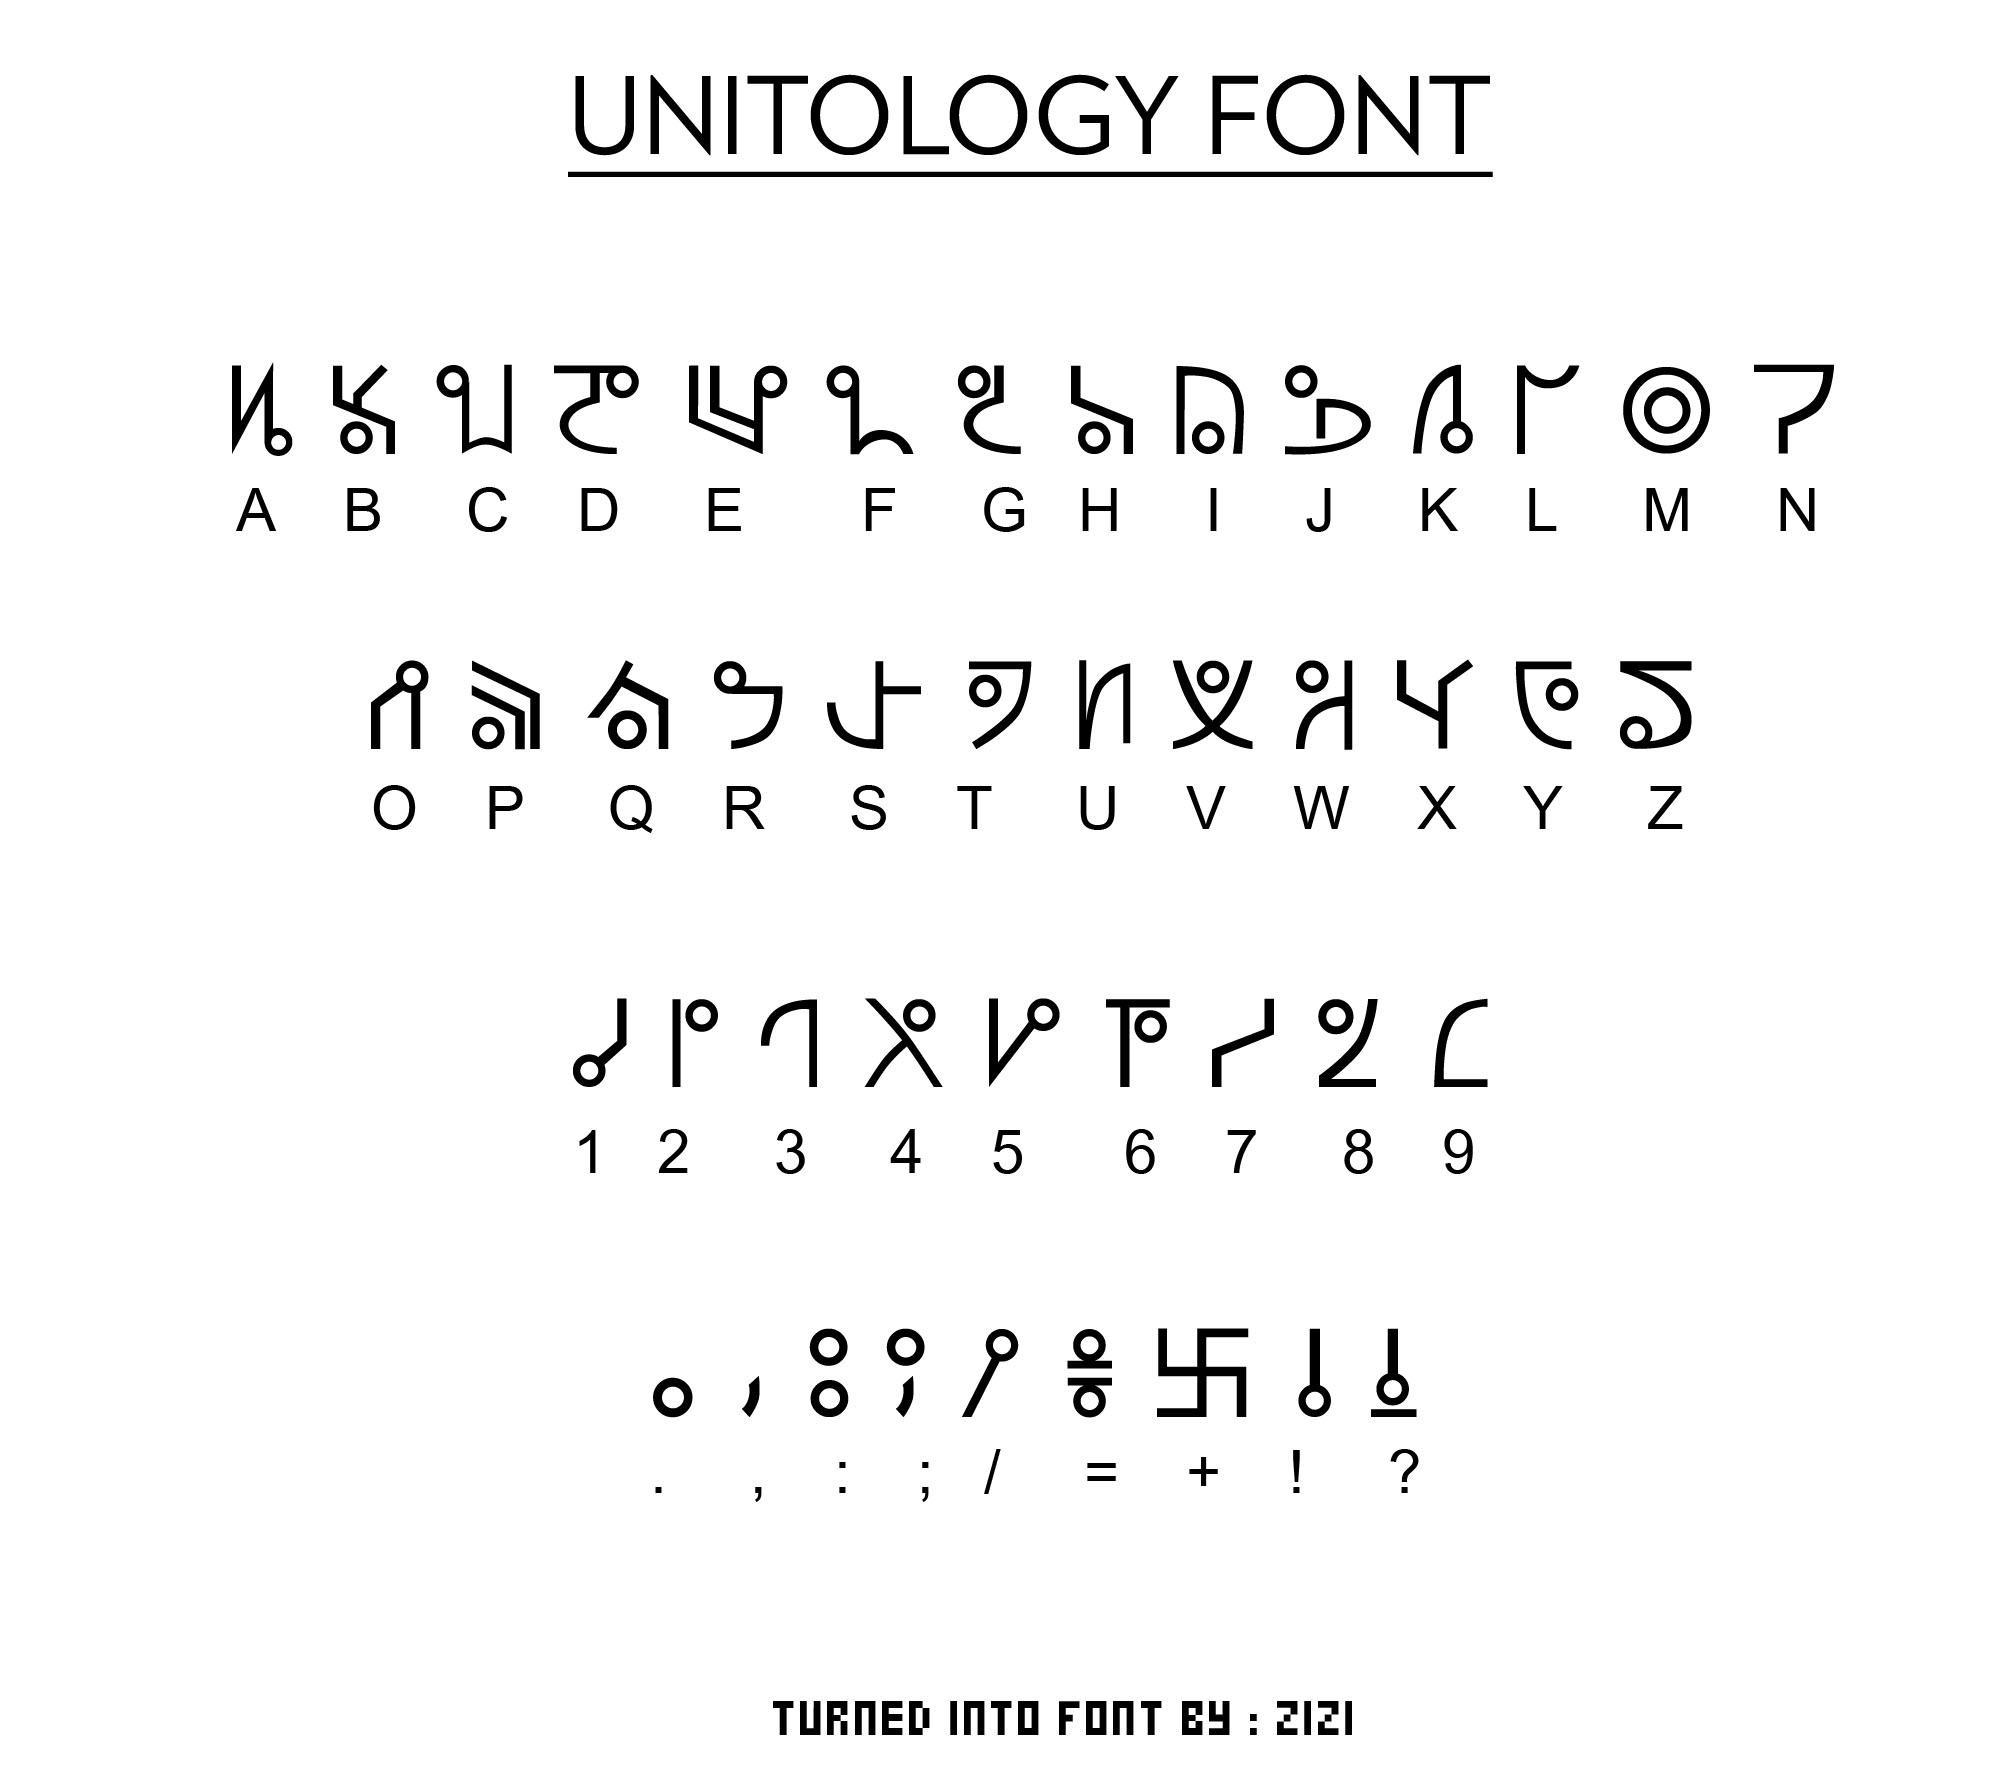 UNITOLOG Font - Dead Space by zizi2008 on DeviantArt